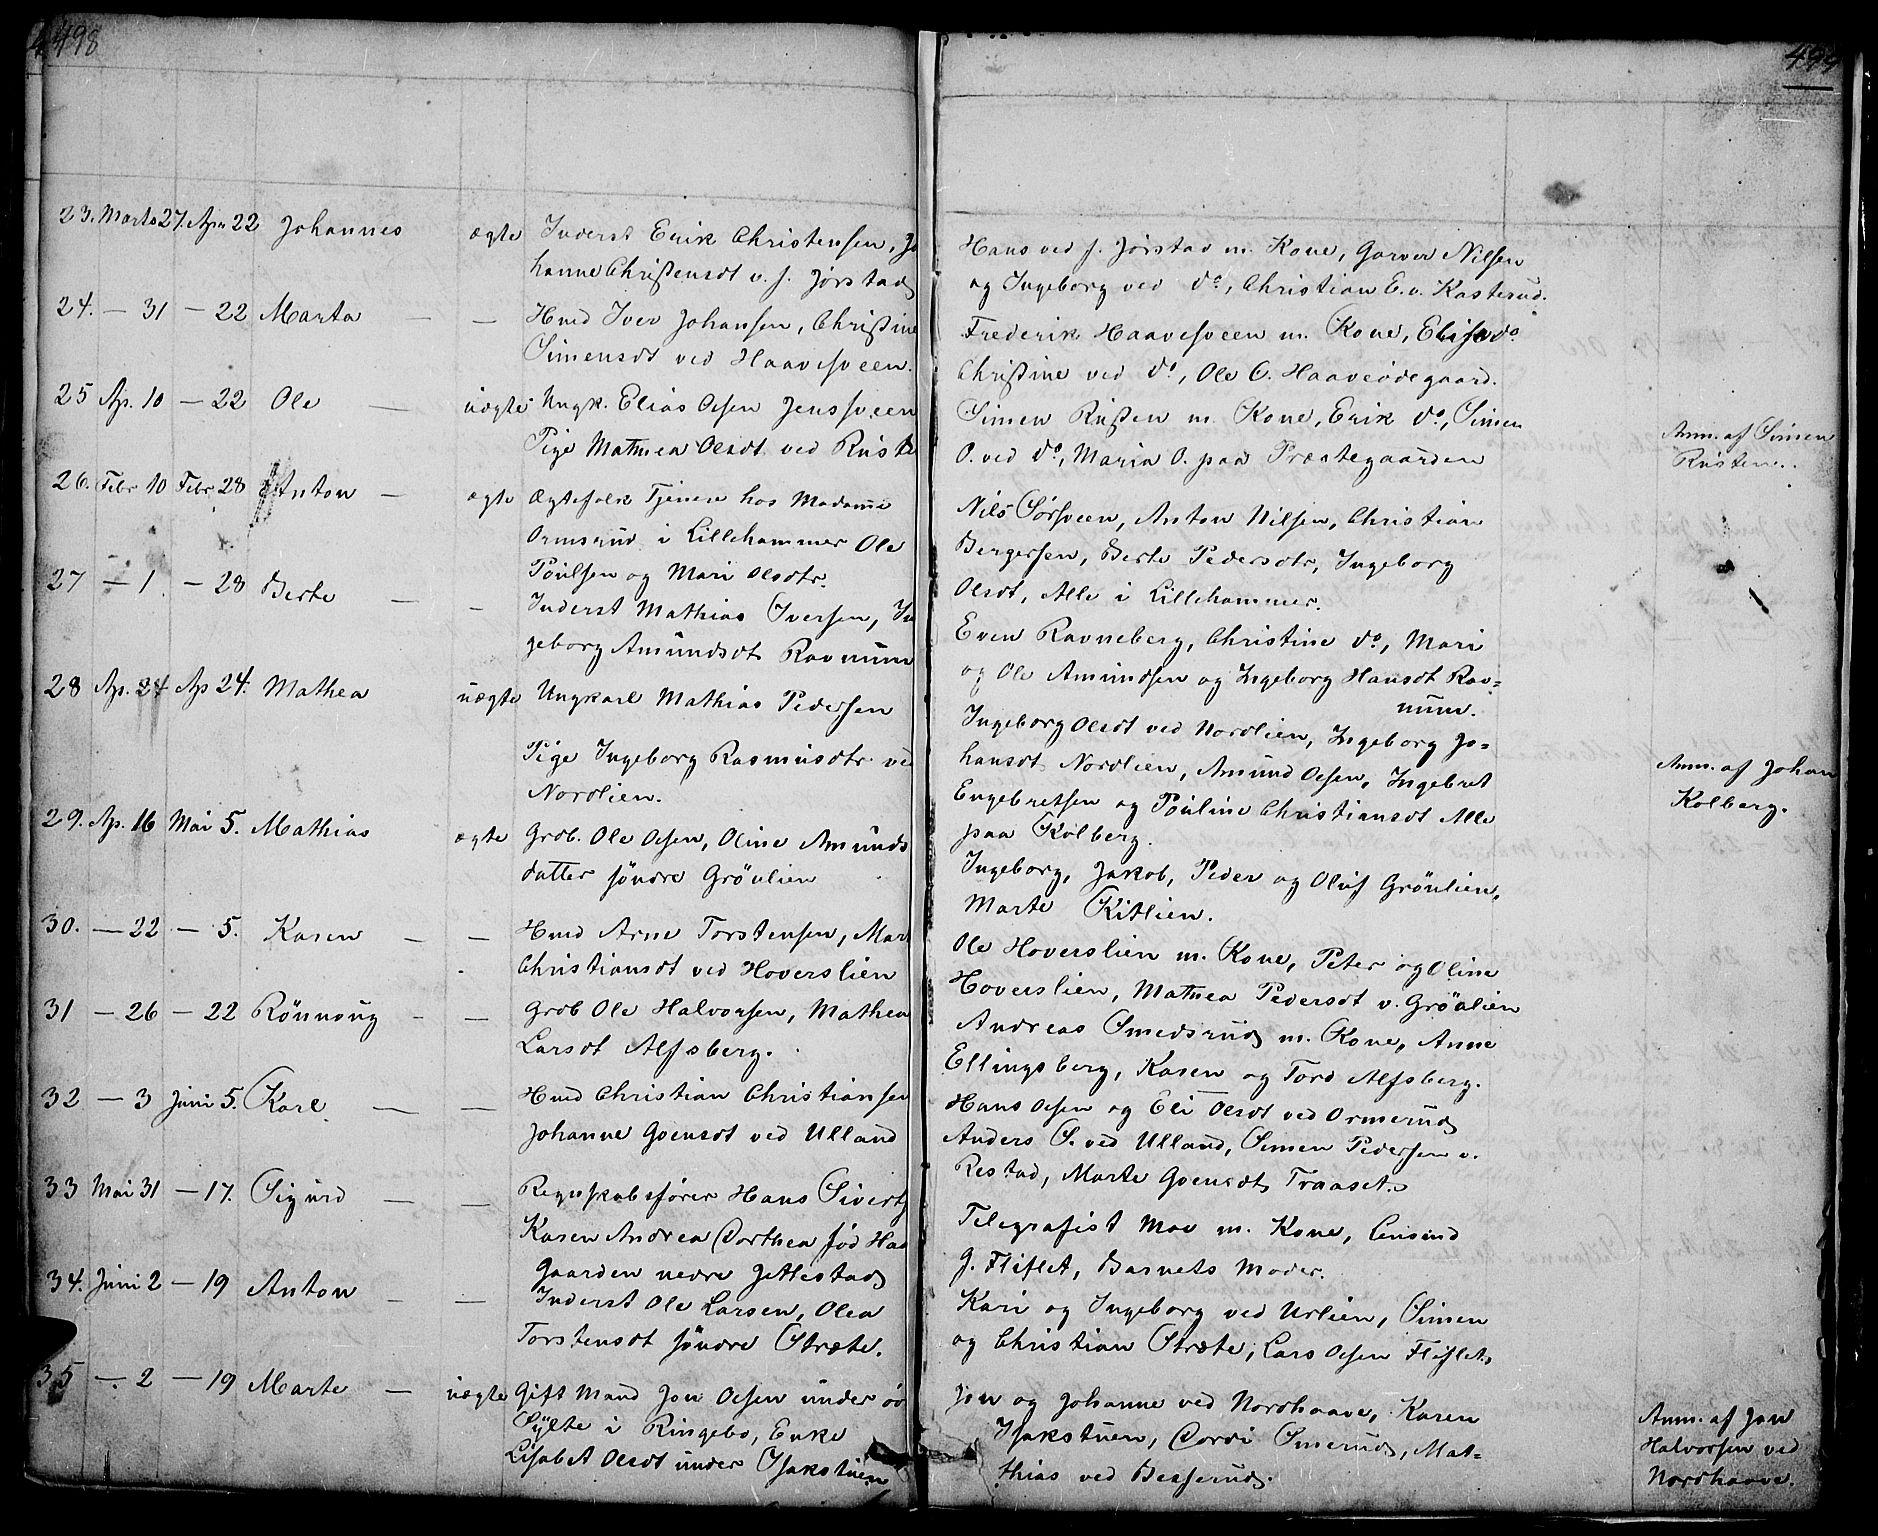 SAH, Fåberg prestekontor, H/Ha/Hab/L0005: Klokkerbok nr. 5, 1837-1864, s. 498-499